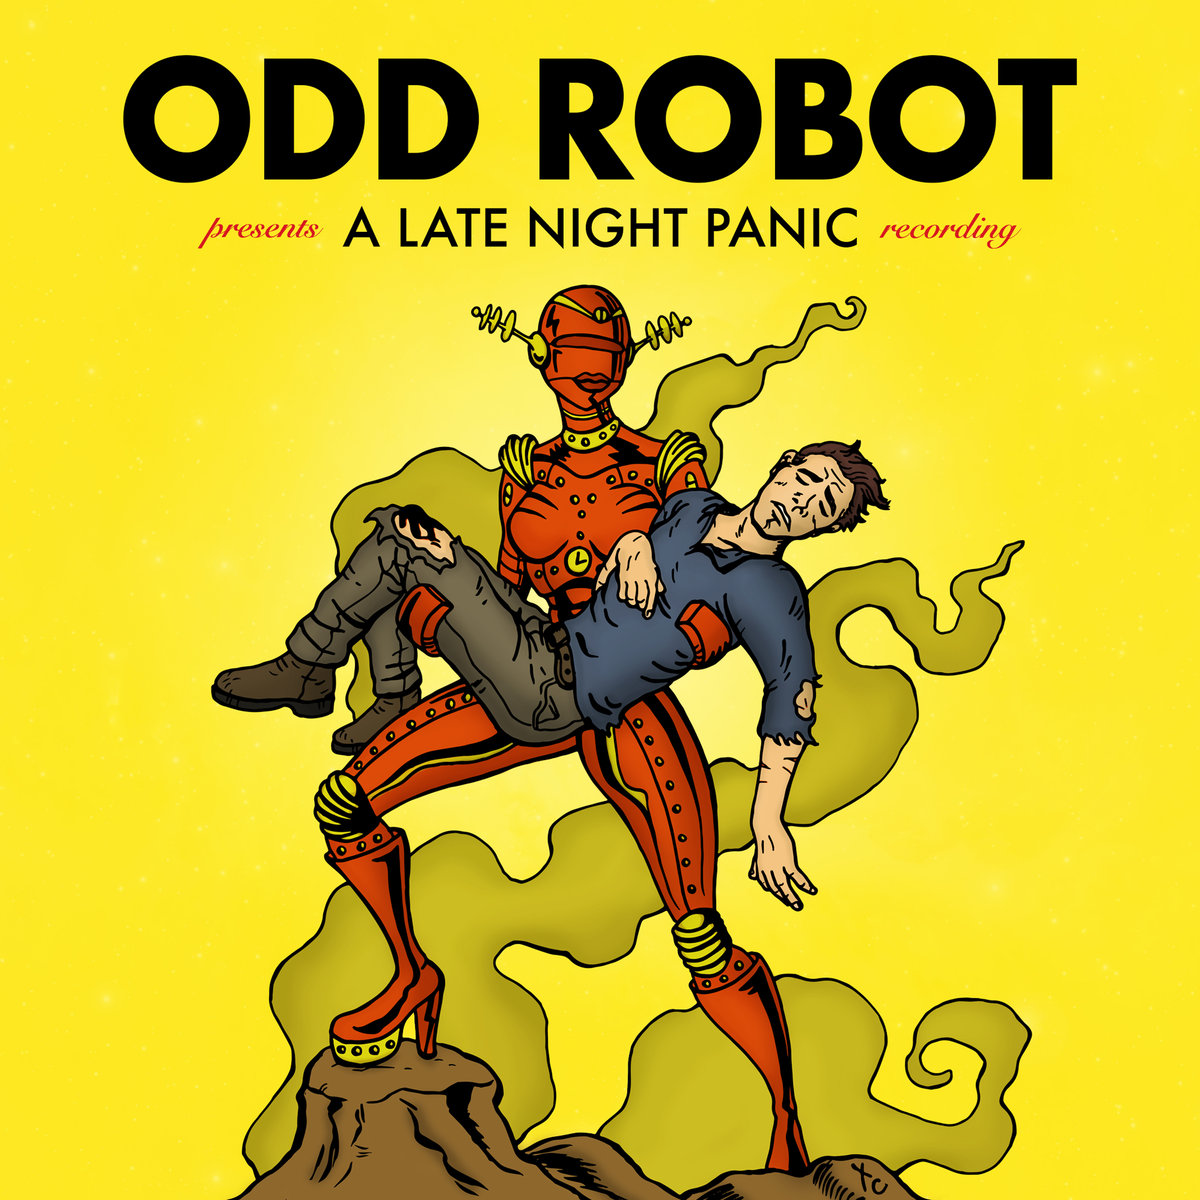 Odd Robot